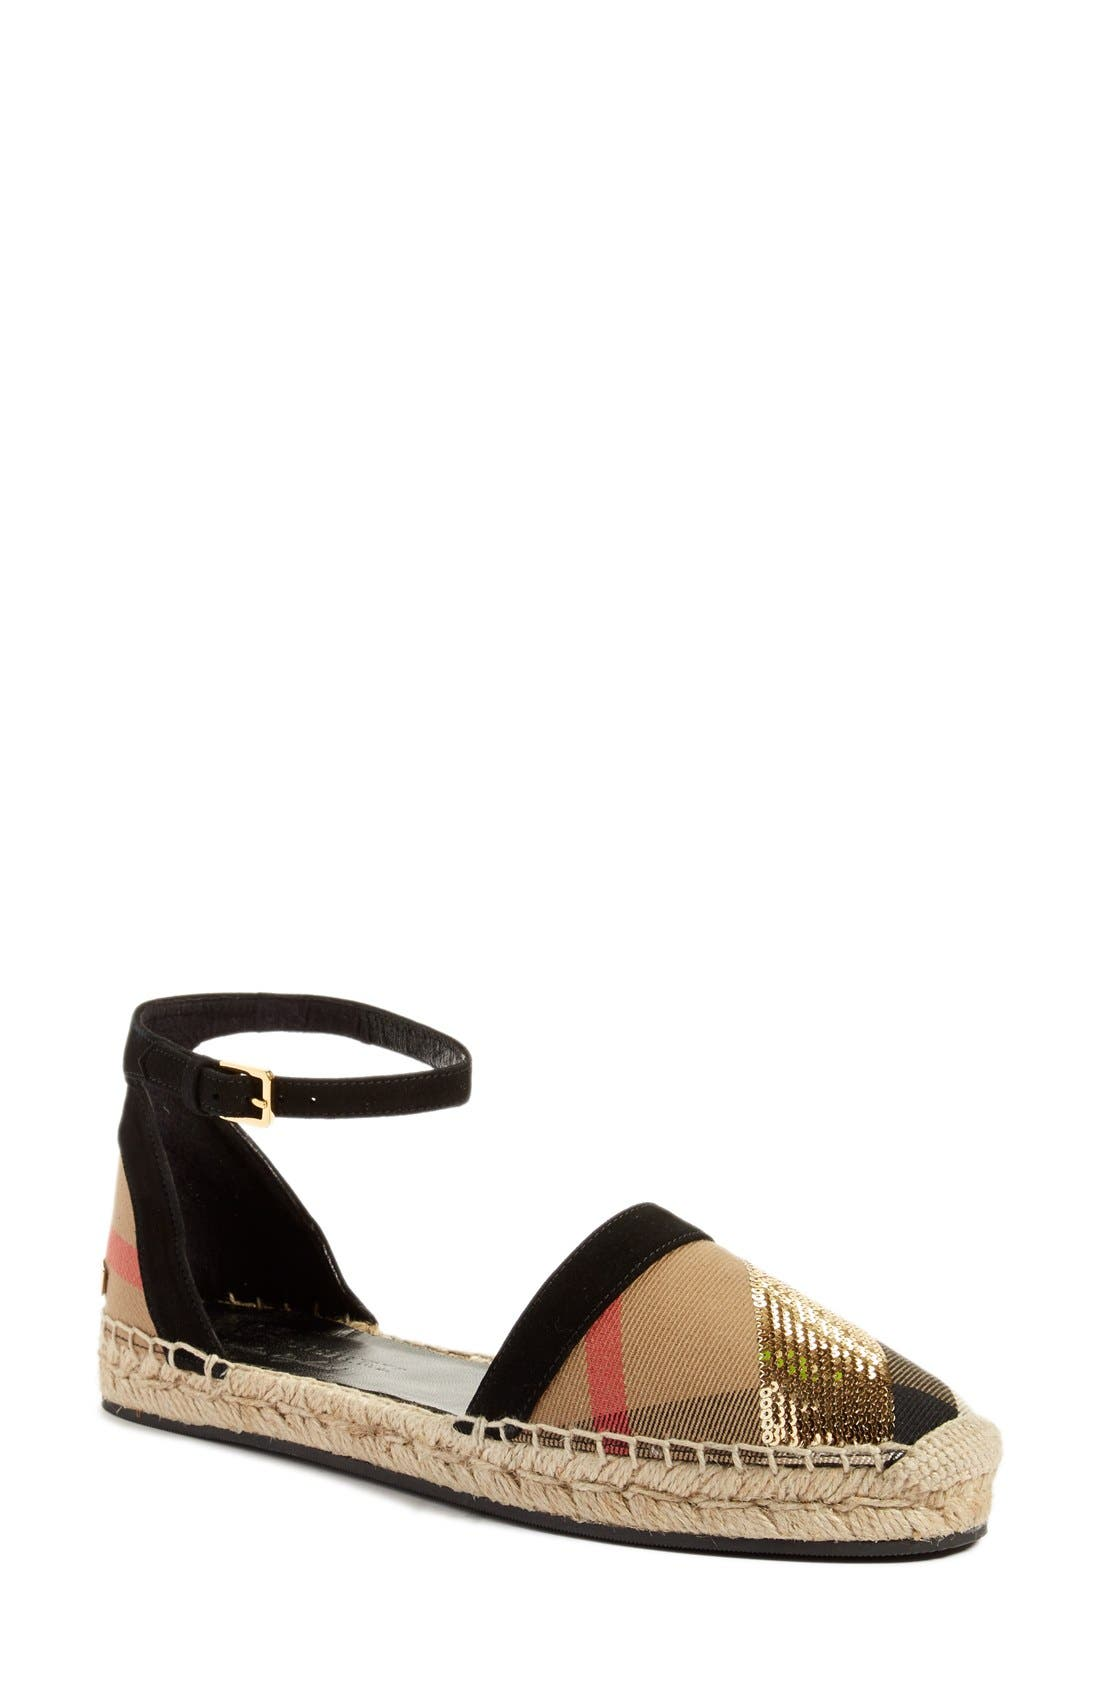 Alternate Image 1 Selected - Burberry 'Abbingdon' Ankle Strap Espadrille Sandal (Women)